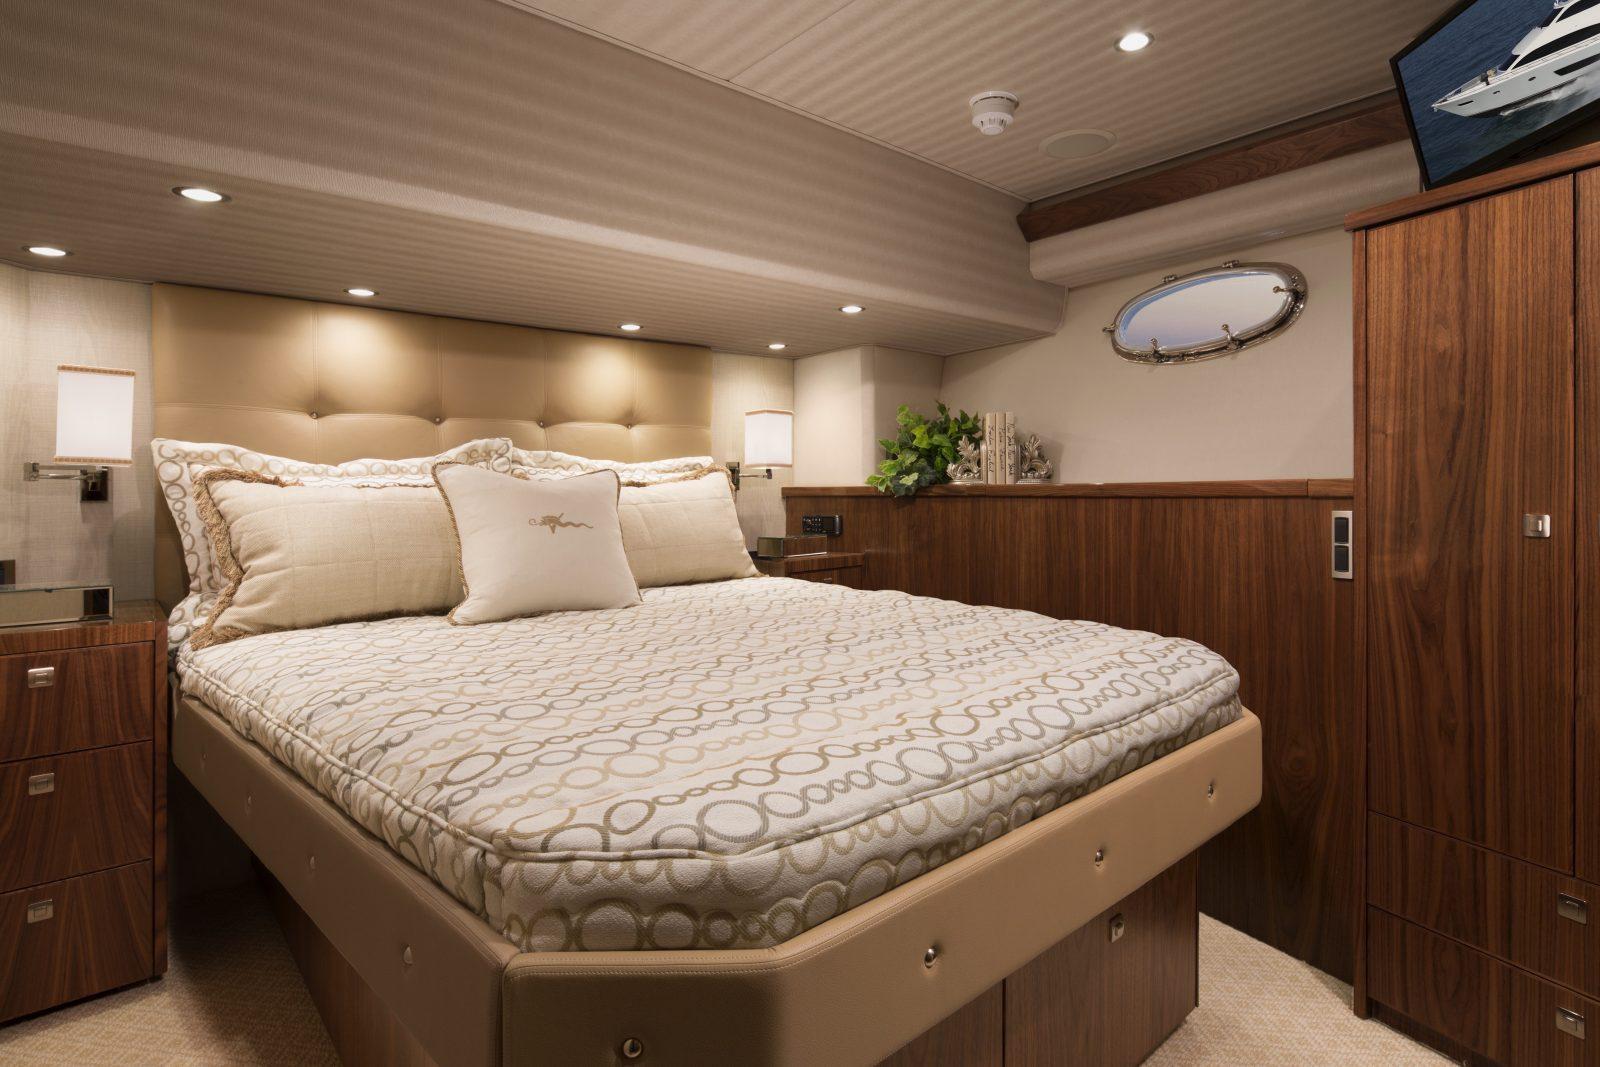 75my11 | 75 Motor Yacht